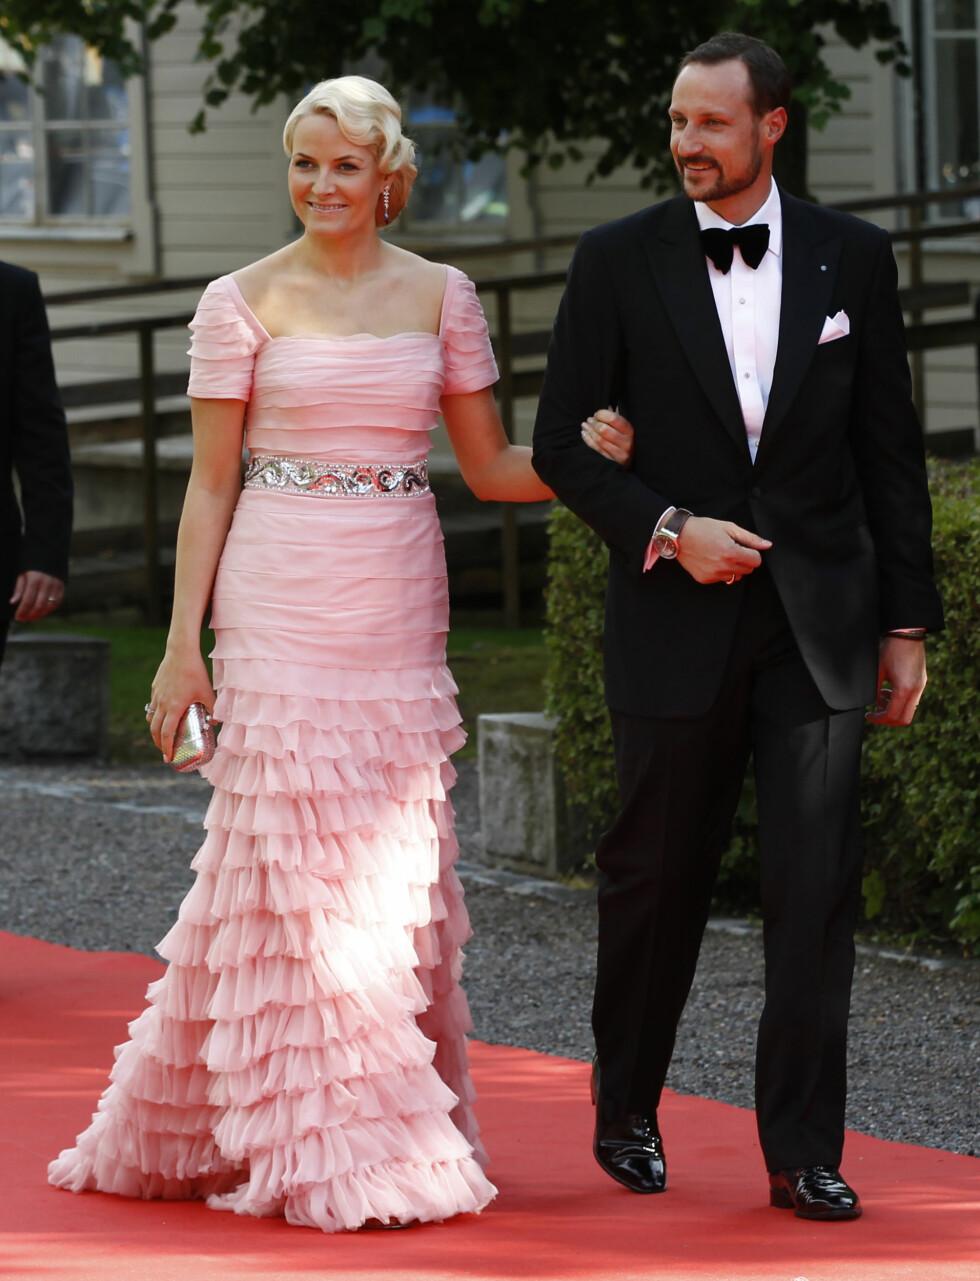 PÅ MIDDAG: Kronprinsparet feiret bryllupet til kronprinsesse Victoria og prins Daniel av Sverige. Foto: Reuters